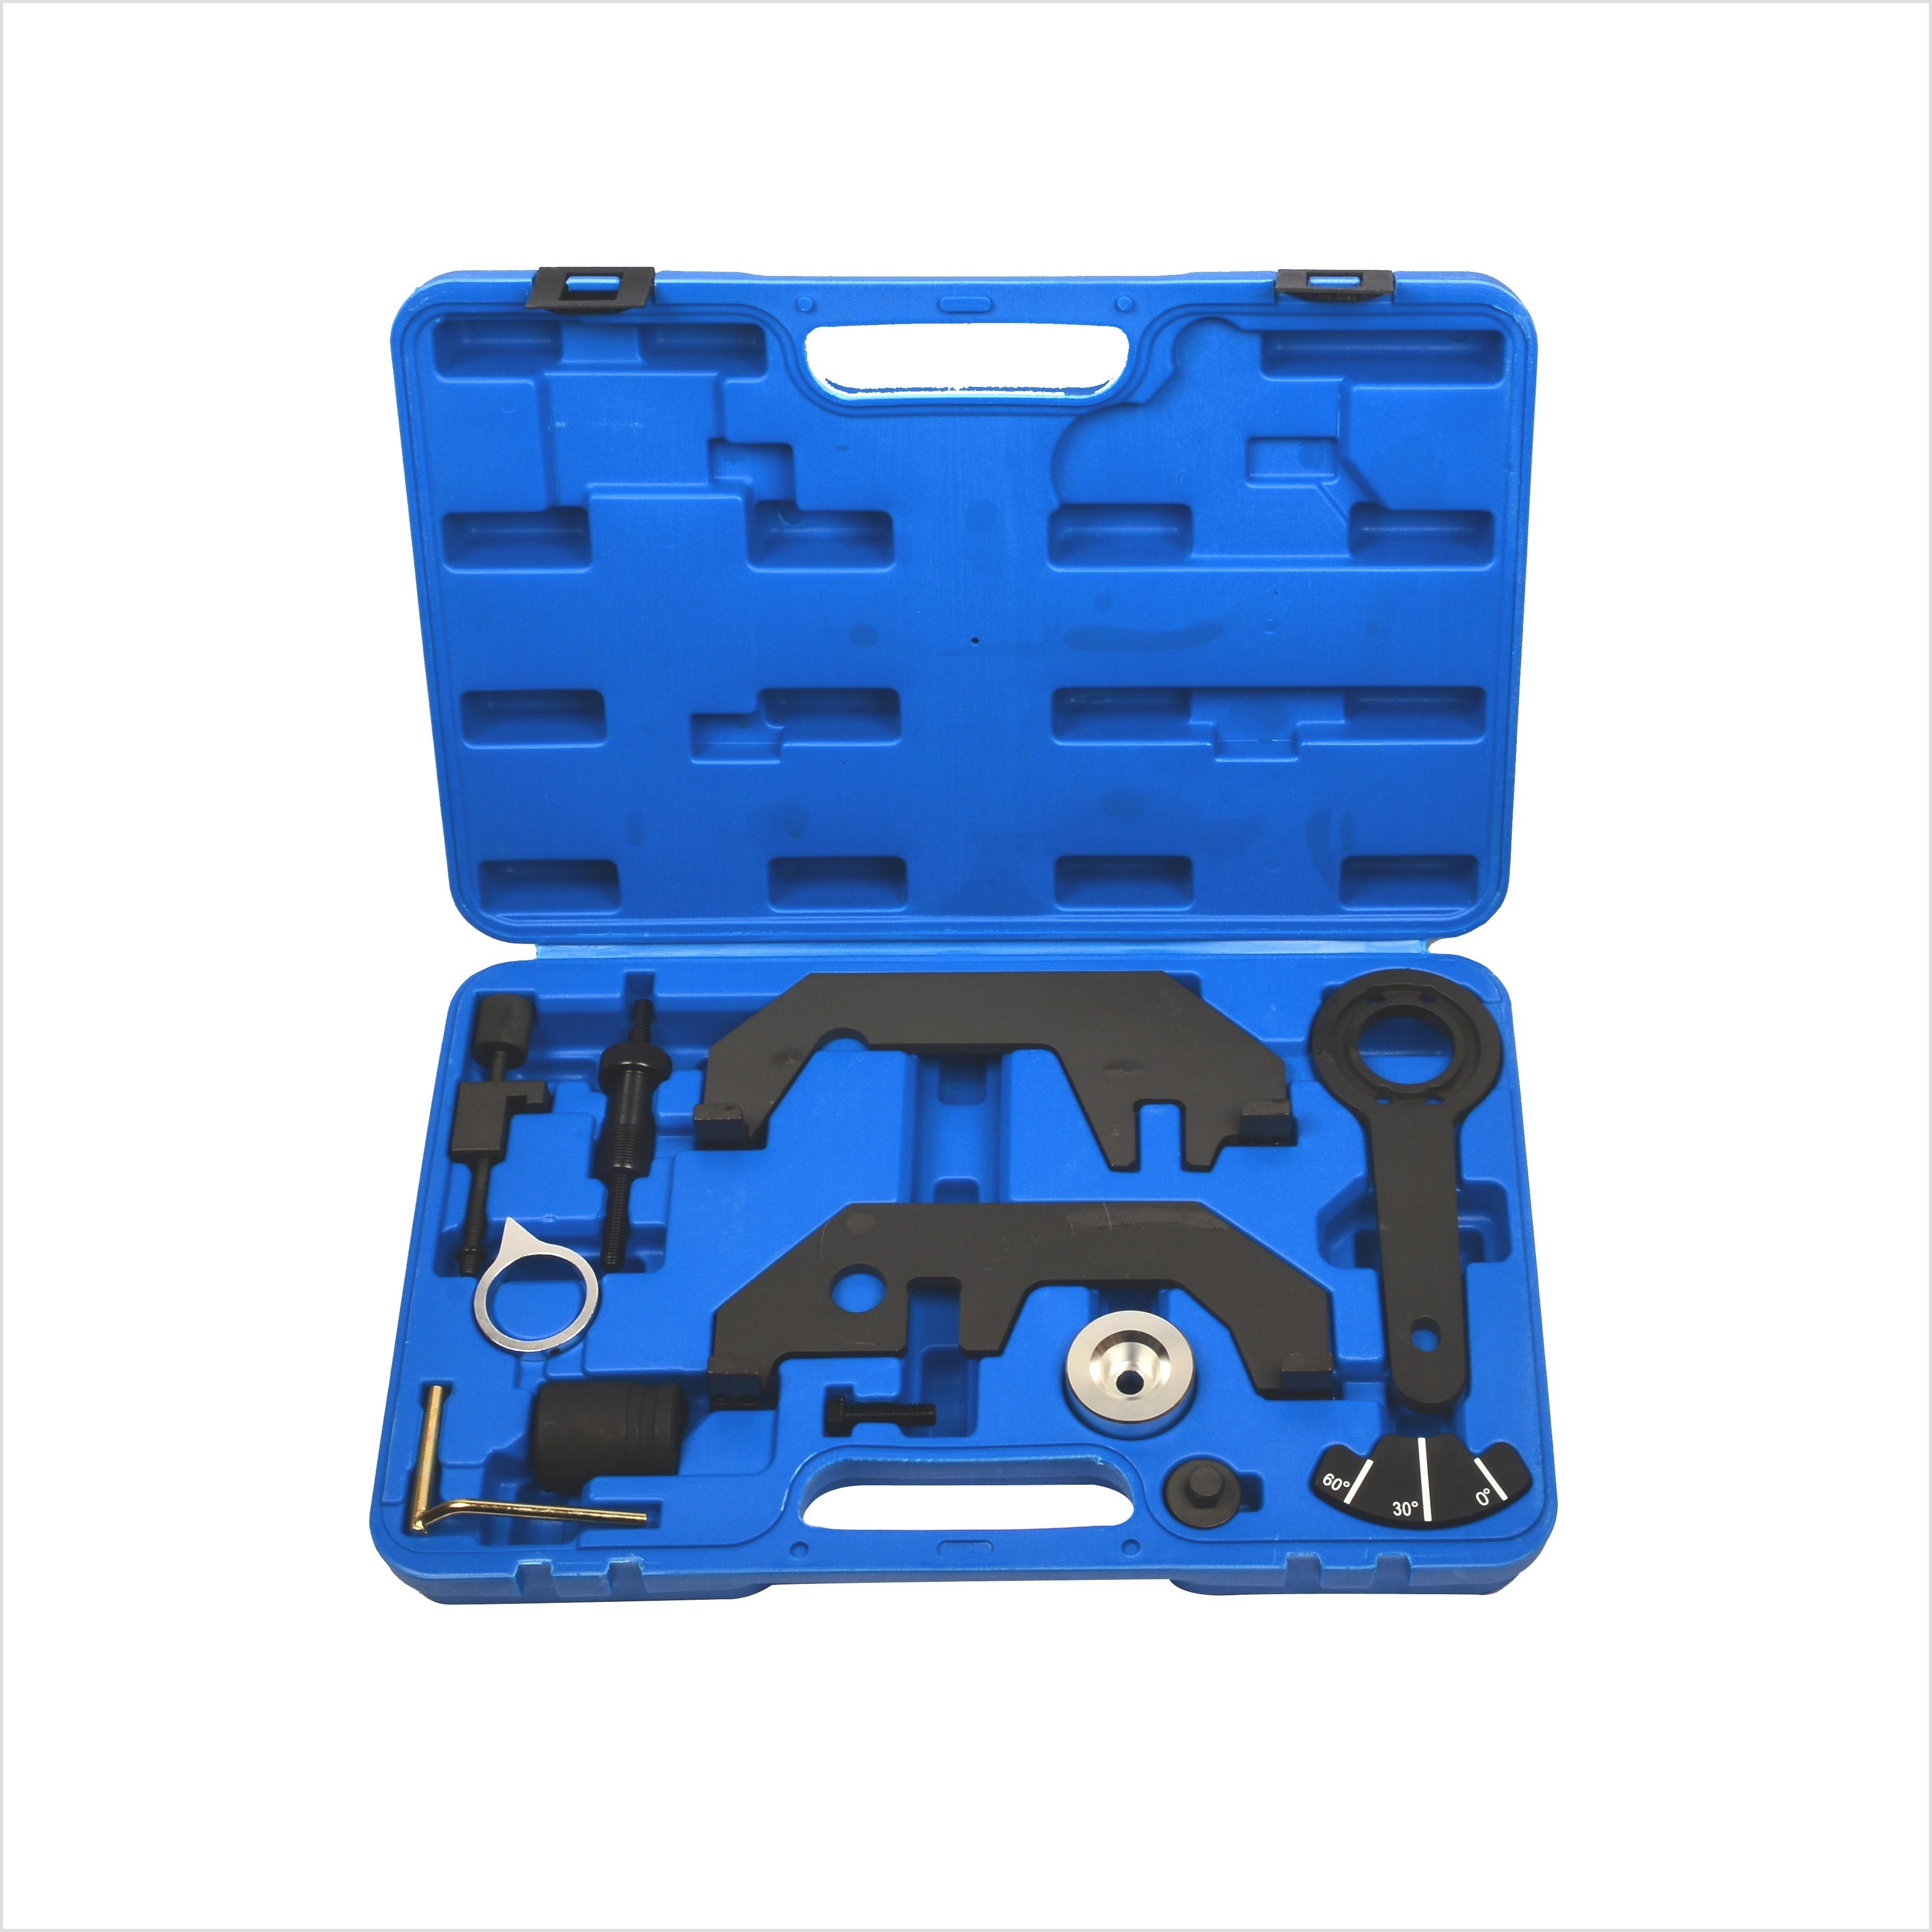 For BMW N62/N73 Alignment Camshaft Crankshaft Timing Master Tool Kit Set metal motor driving gear differential gear set for wltoys a959 a a969 a a979 a k929 a a949 a959 b a969 b a979 b k929 b d30